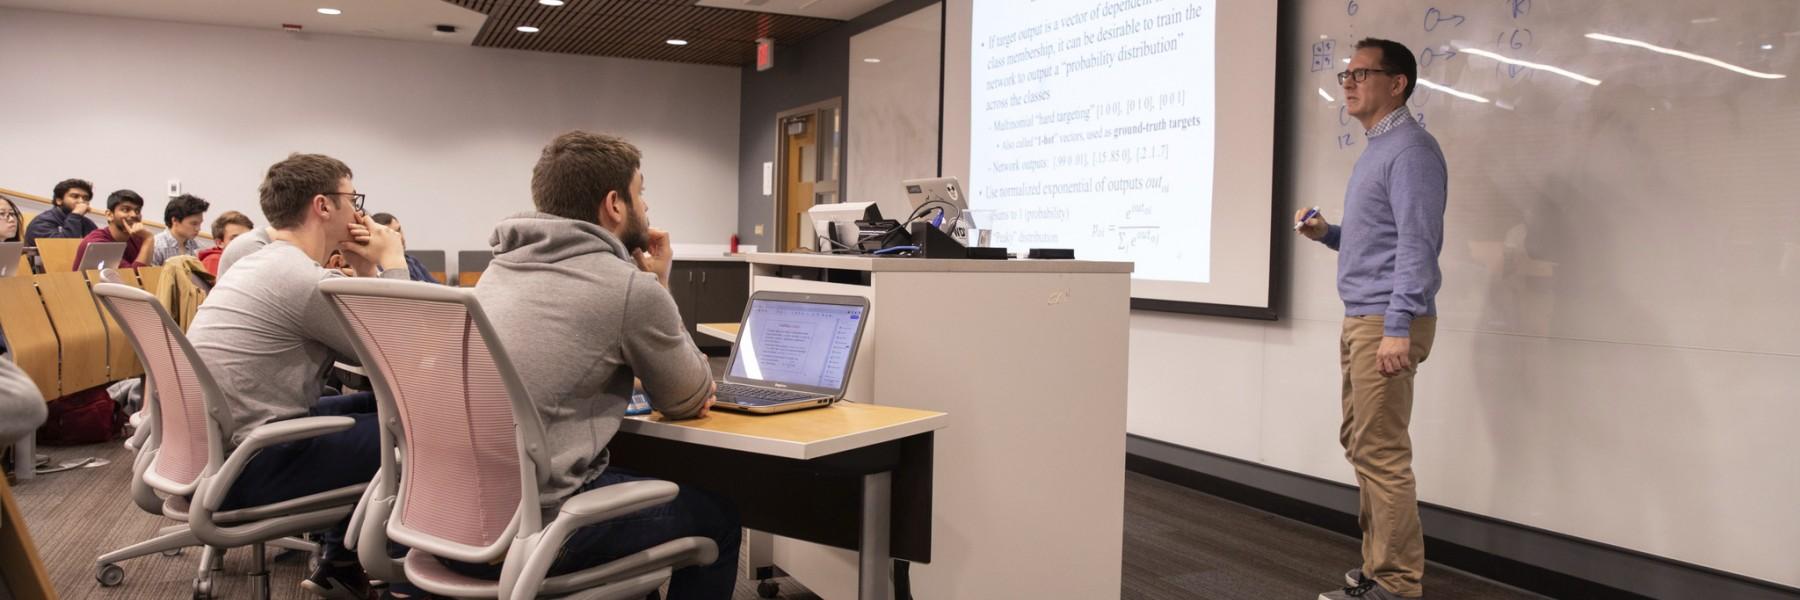 Jim Davis teaching a class at Ohio State